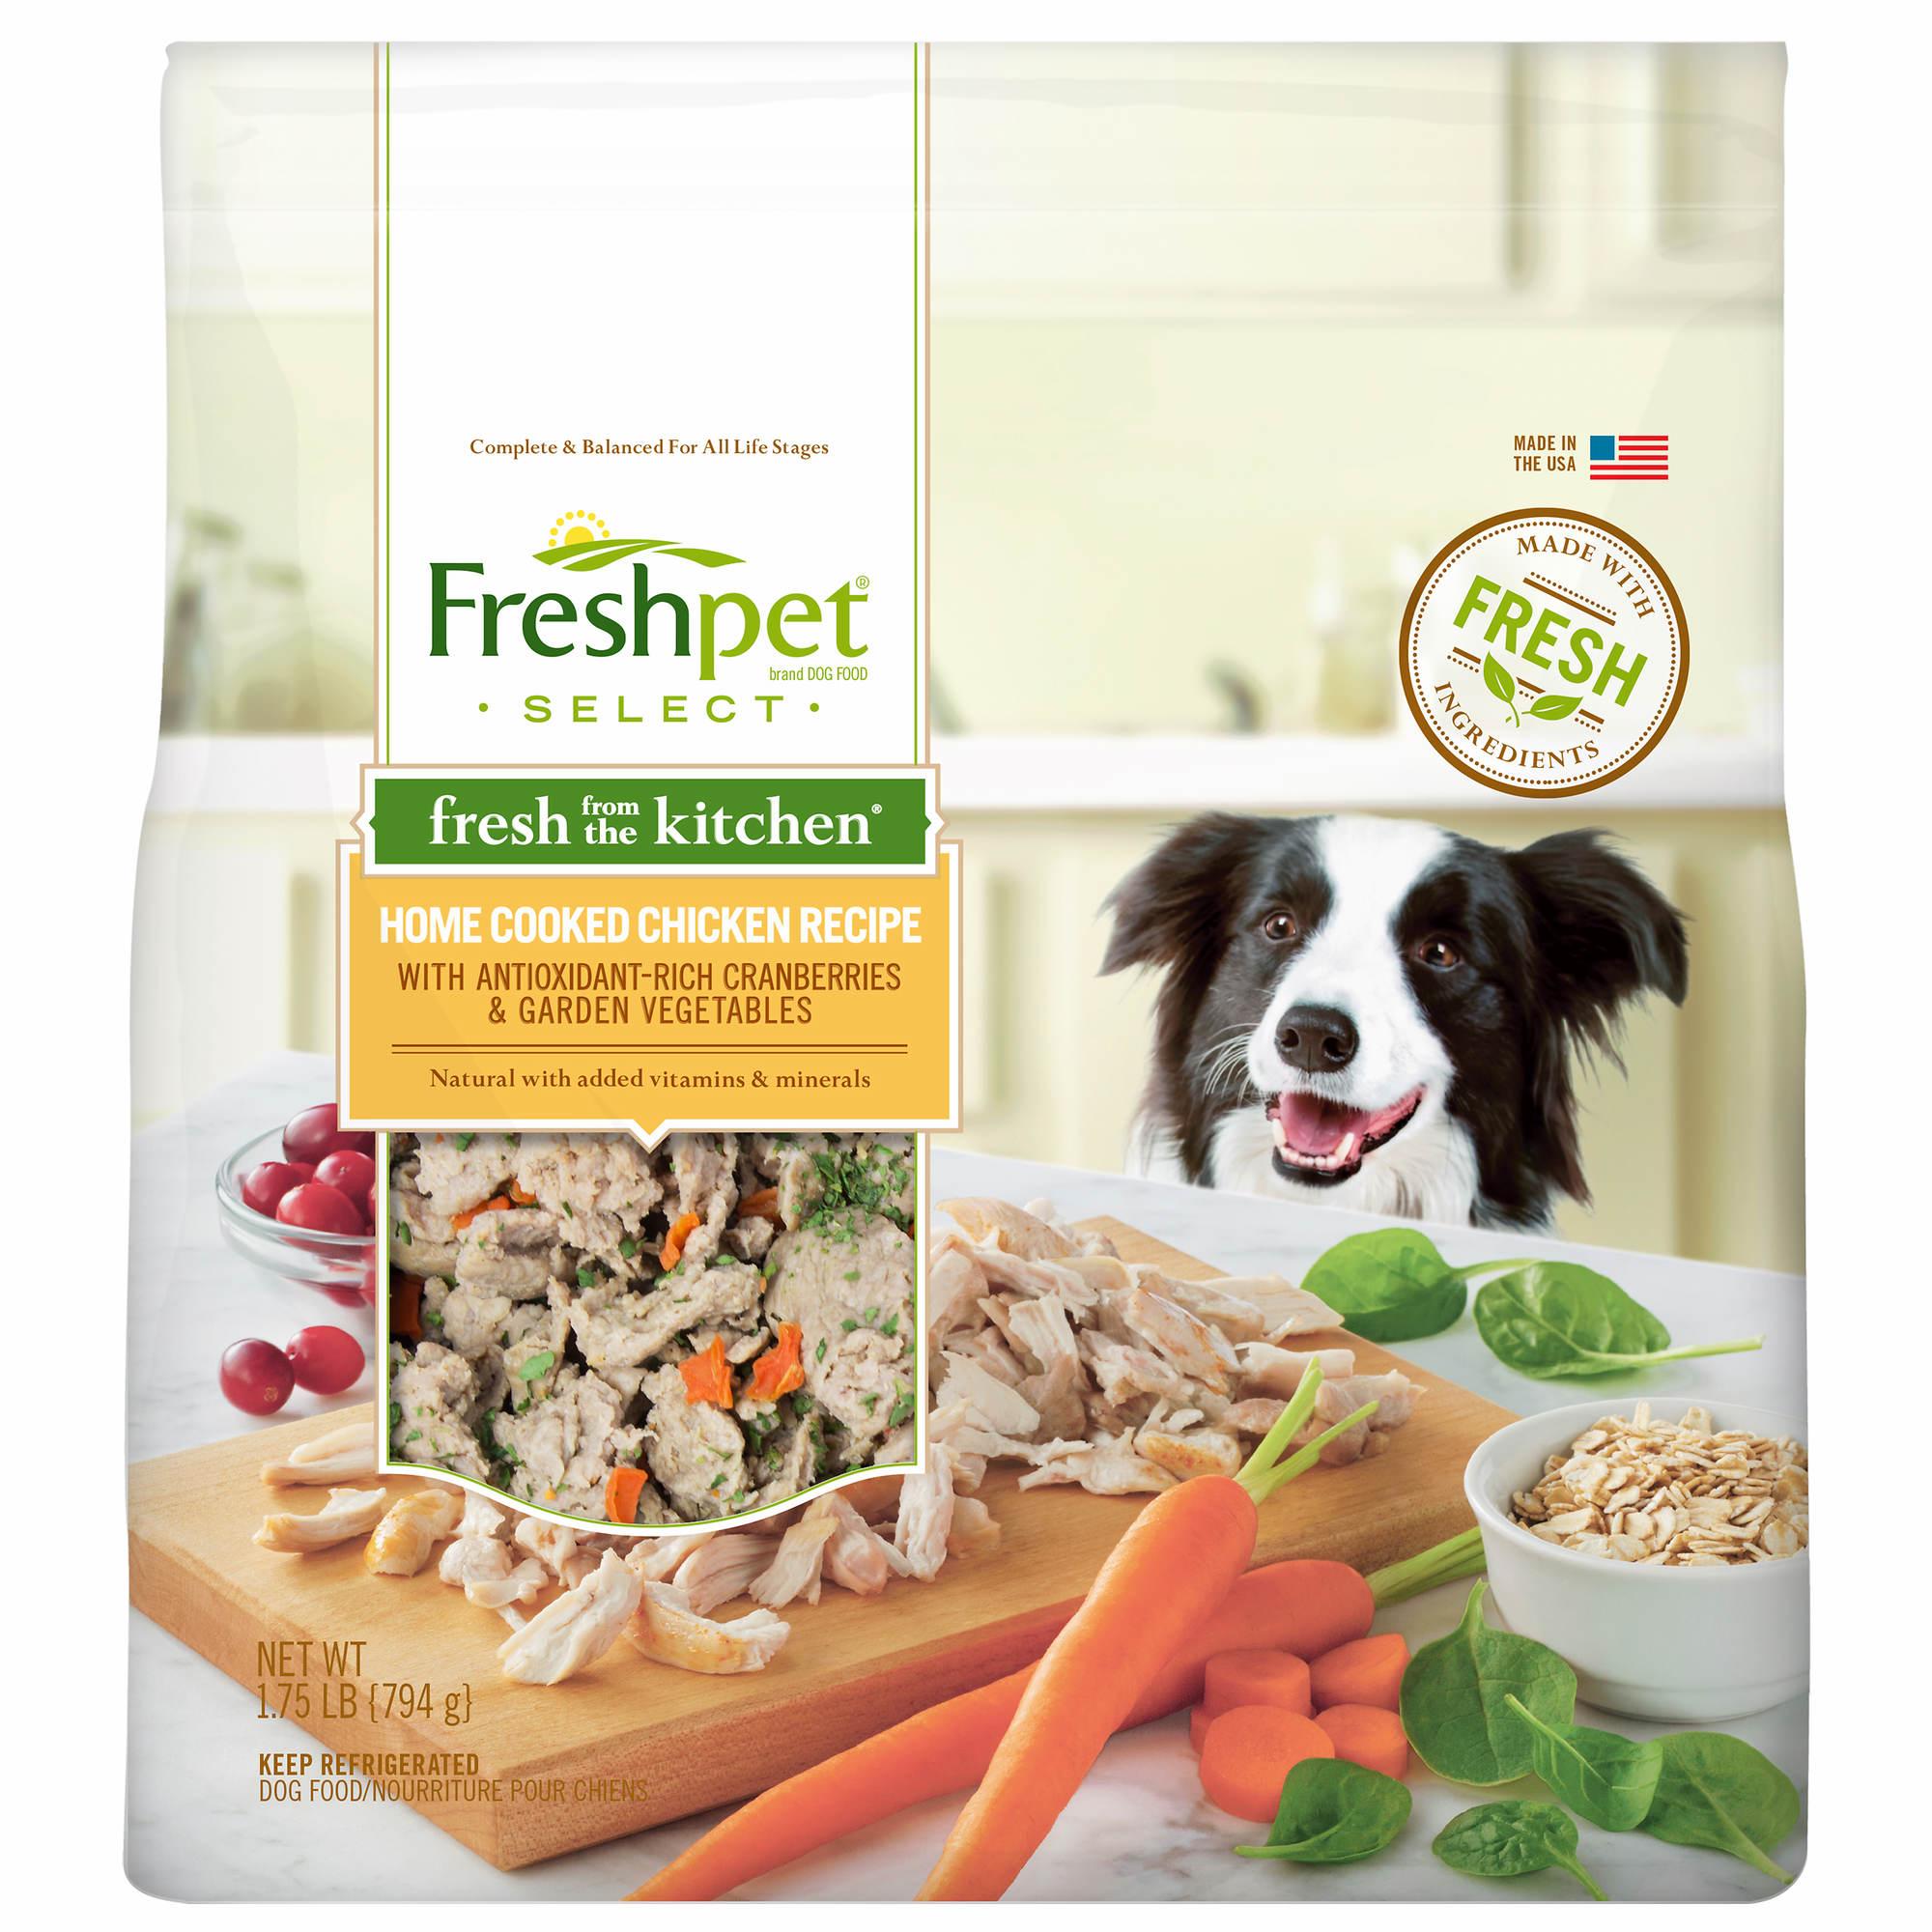 Image Result For Freshpet Dog Food Recall